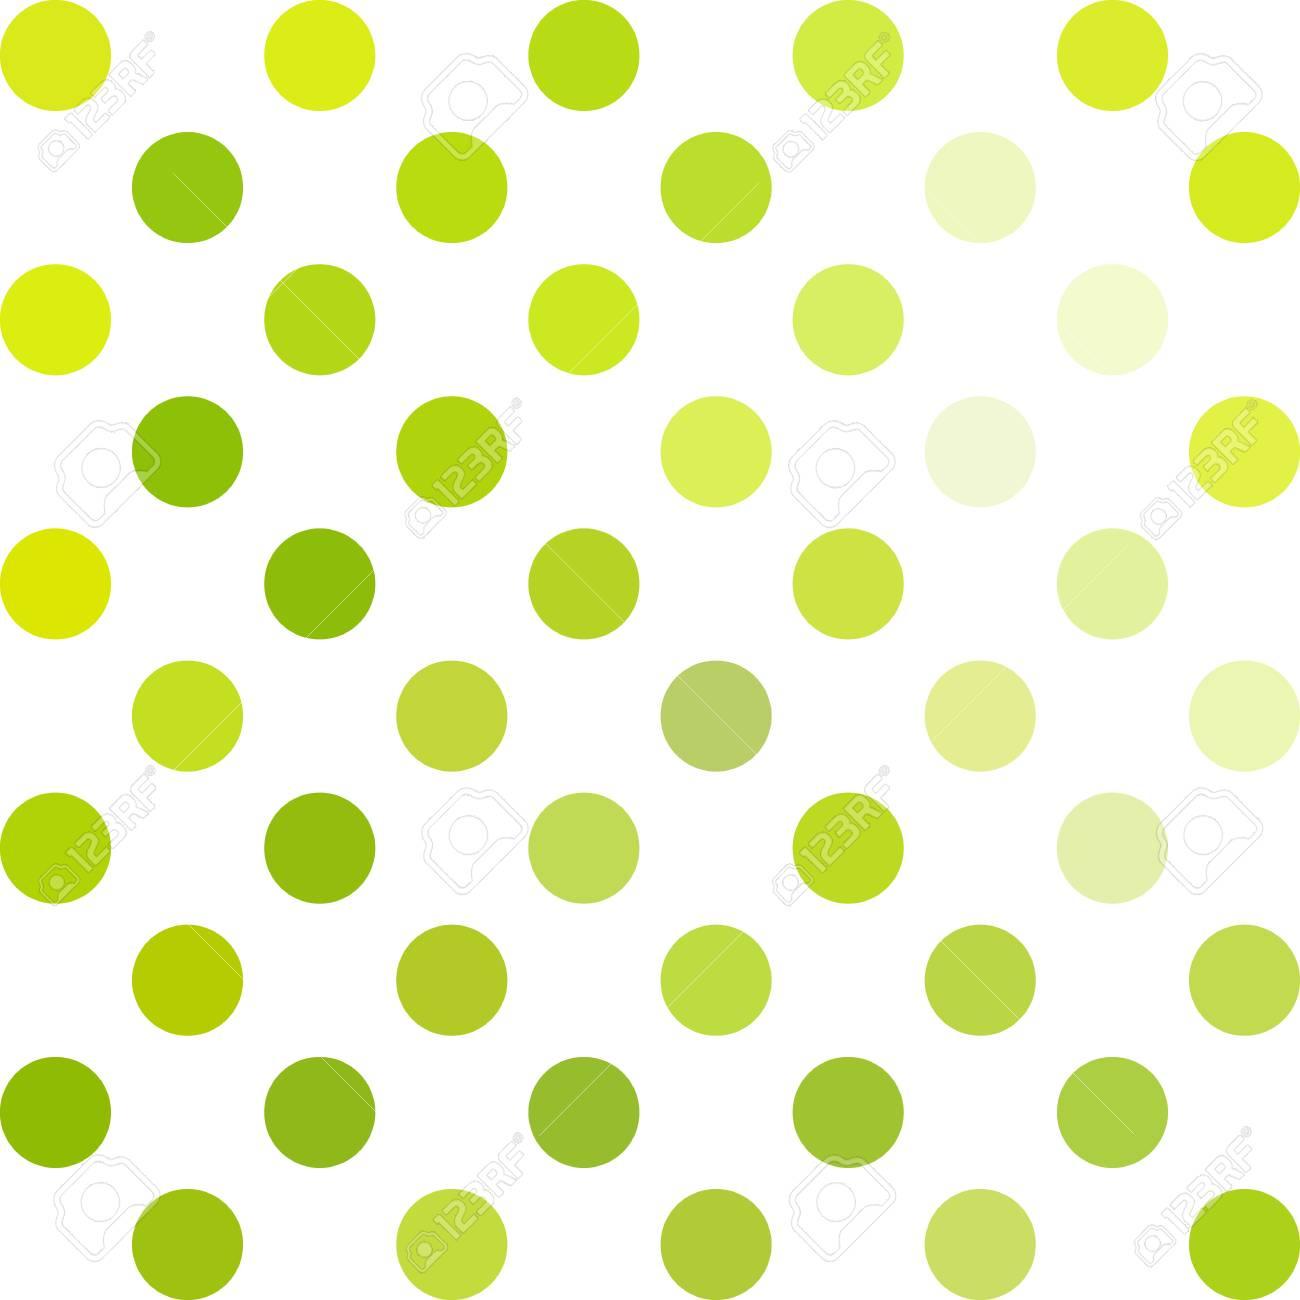 Green Polka Dots Background, Creative Design Templates Royalty Free ...